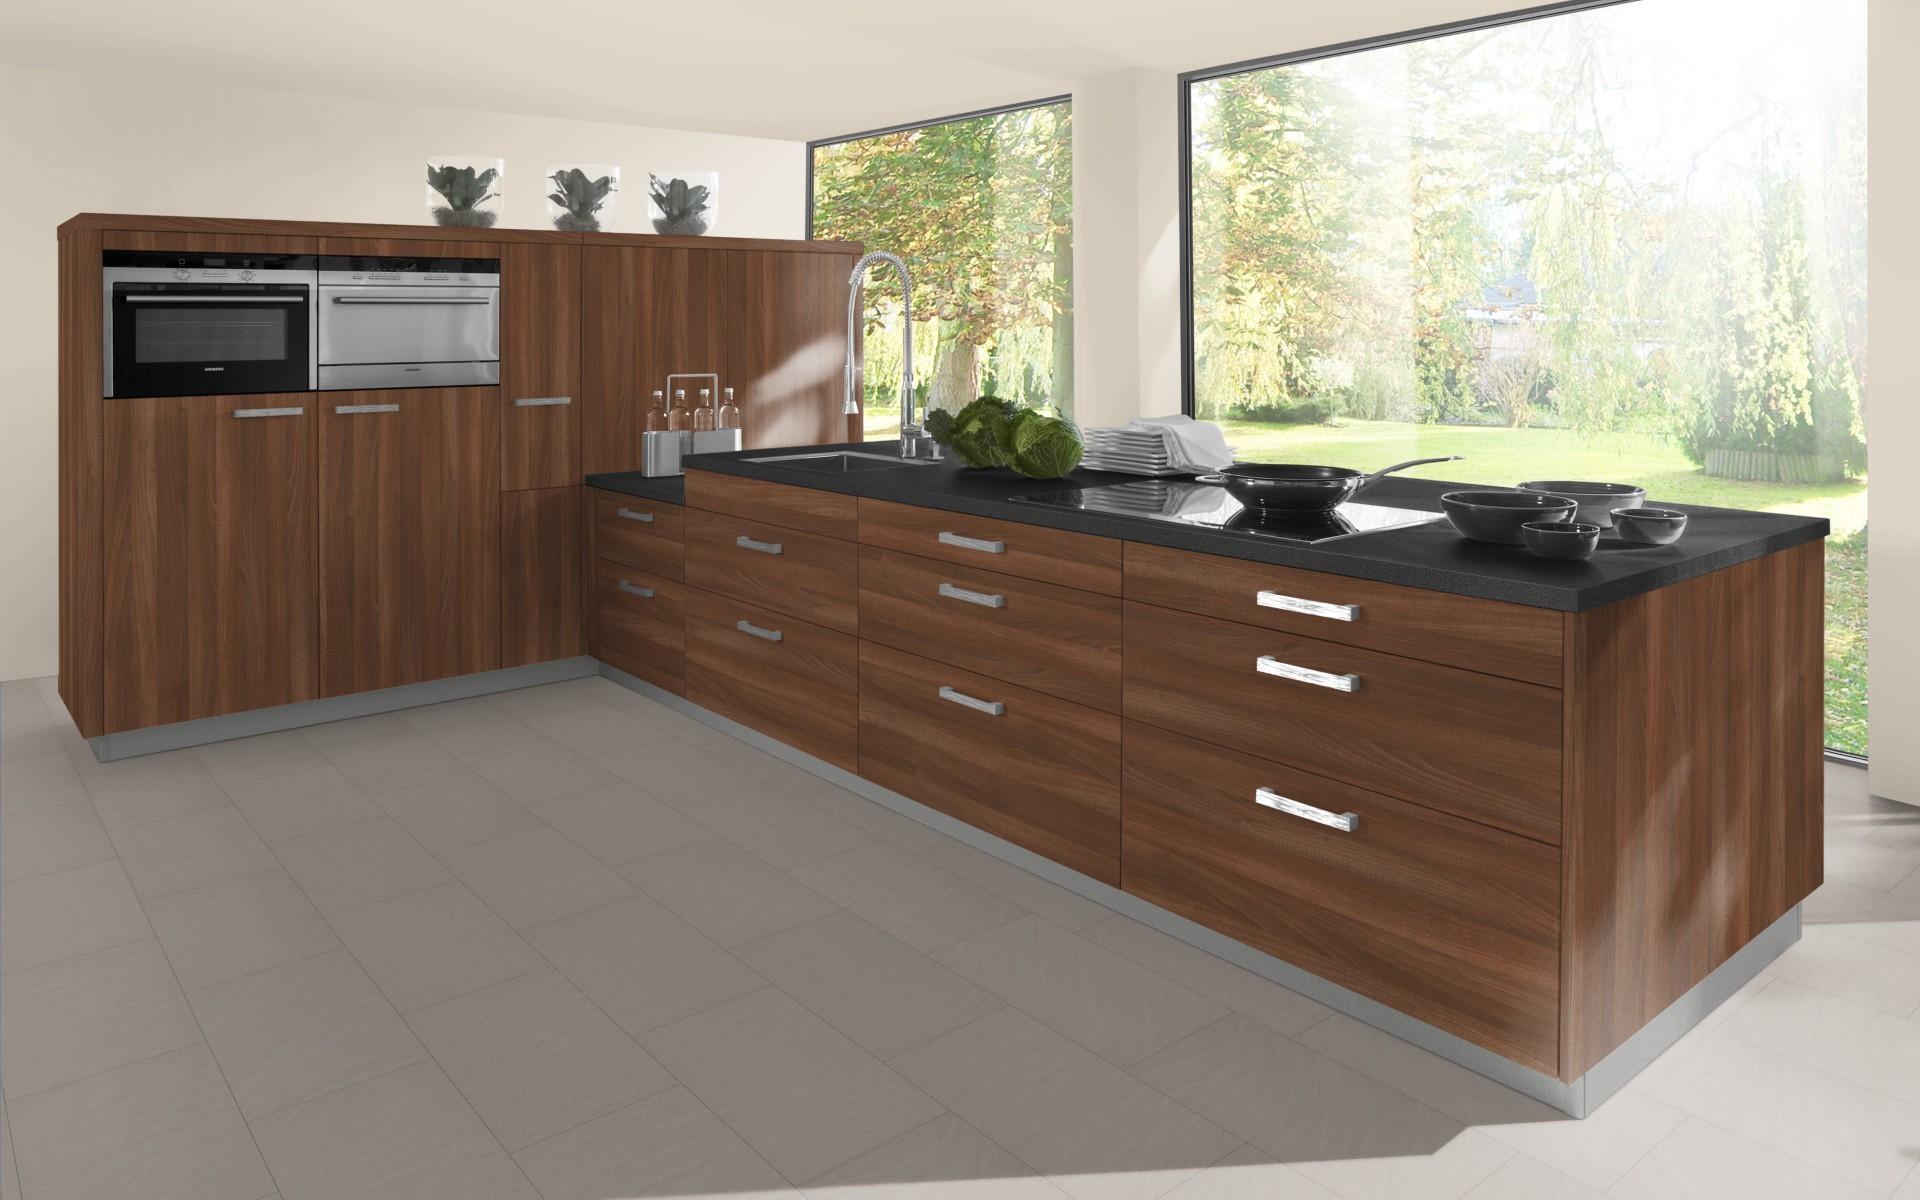 Classic Woodgrain Kitchen Door in Aida Walnut